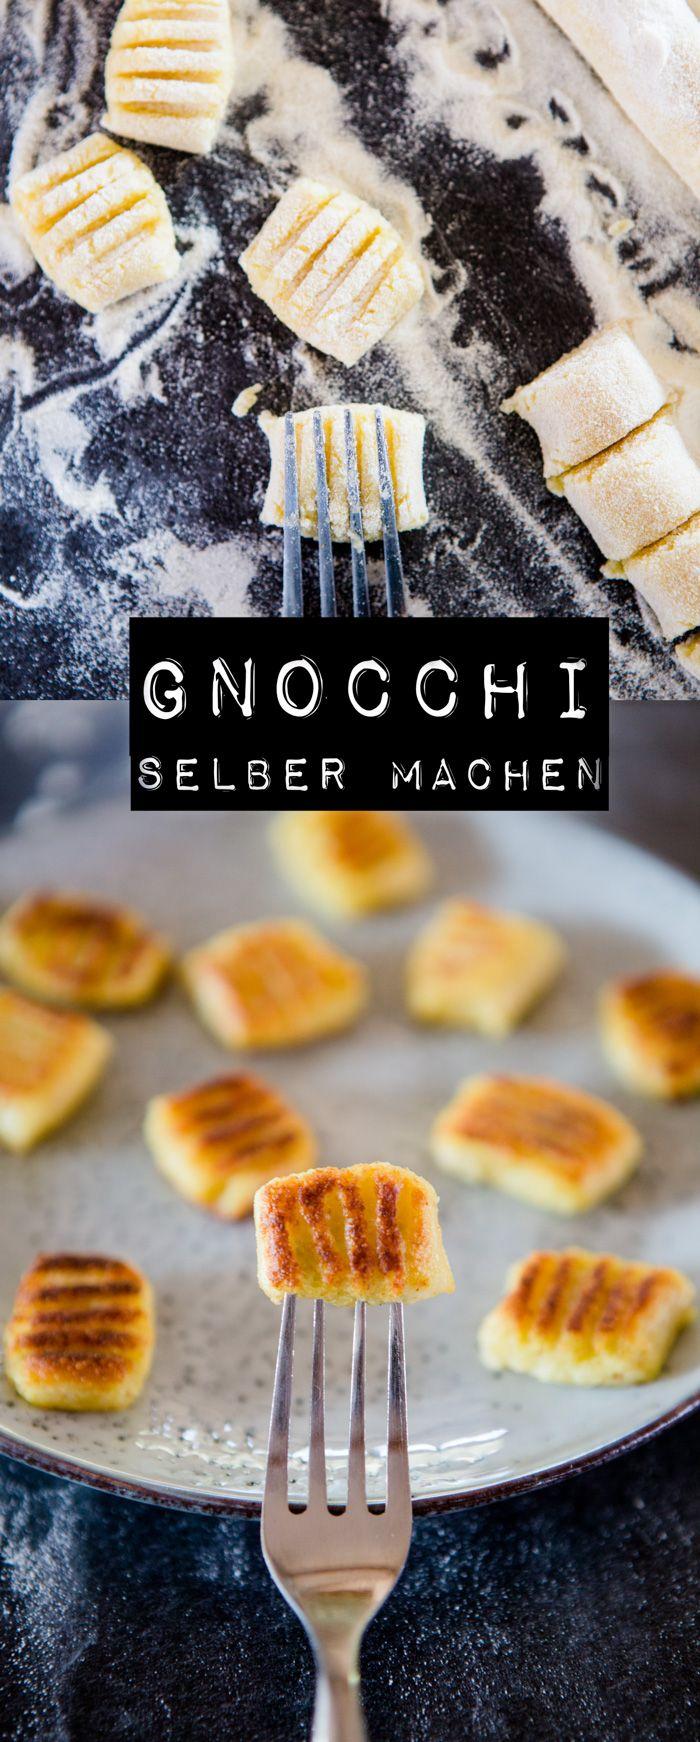 Gnocchi selber machen - www.kuechenchaotin.de